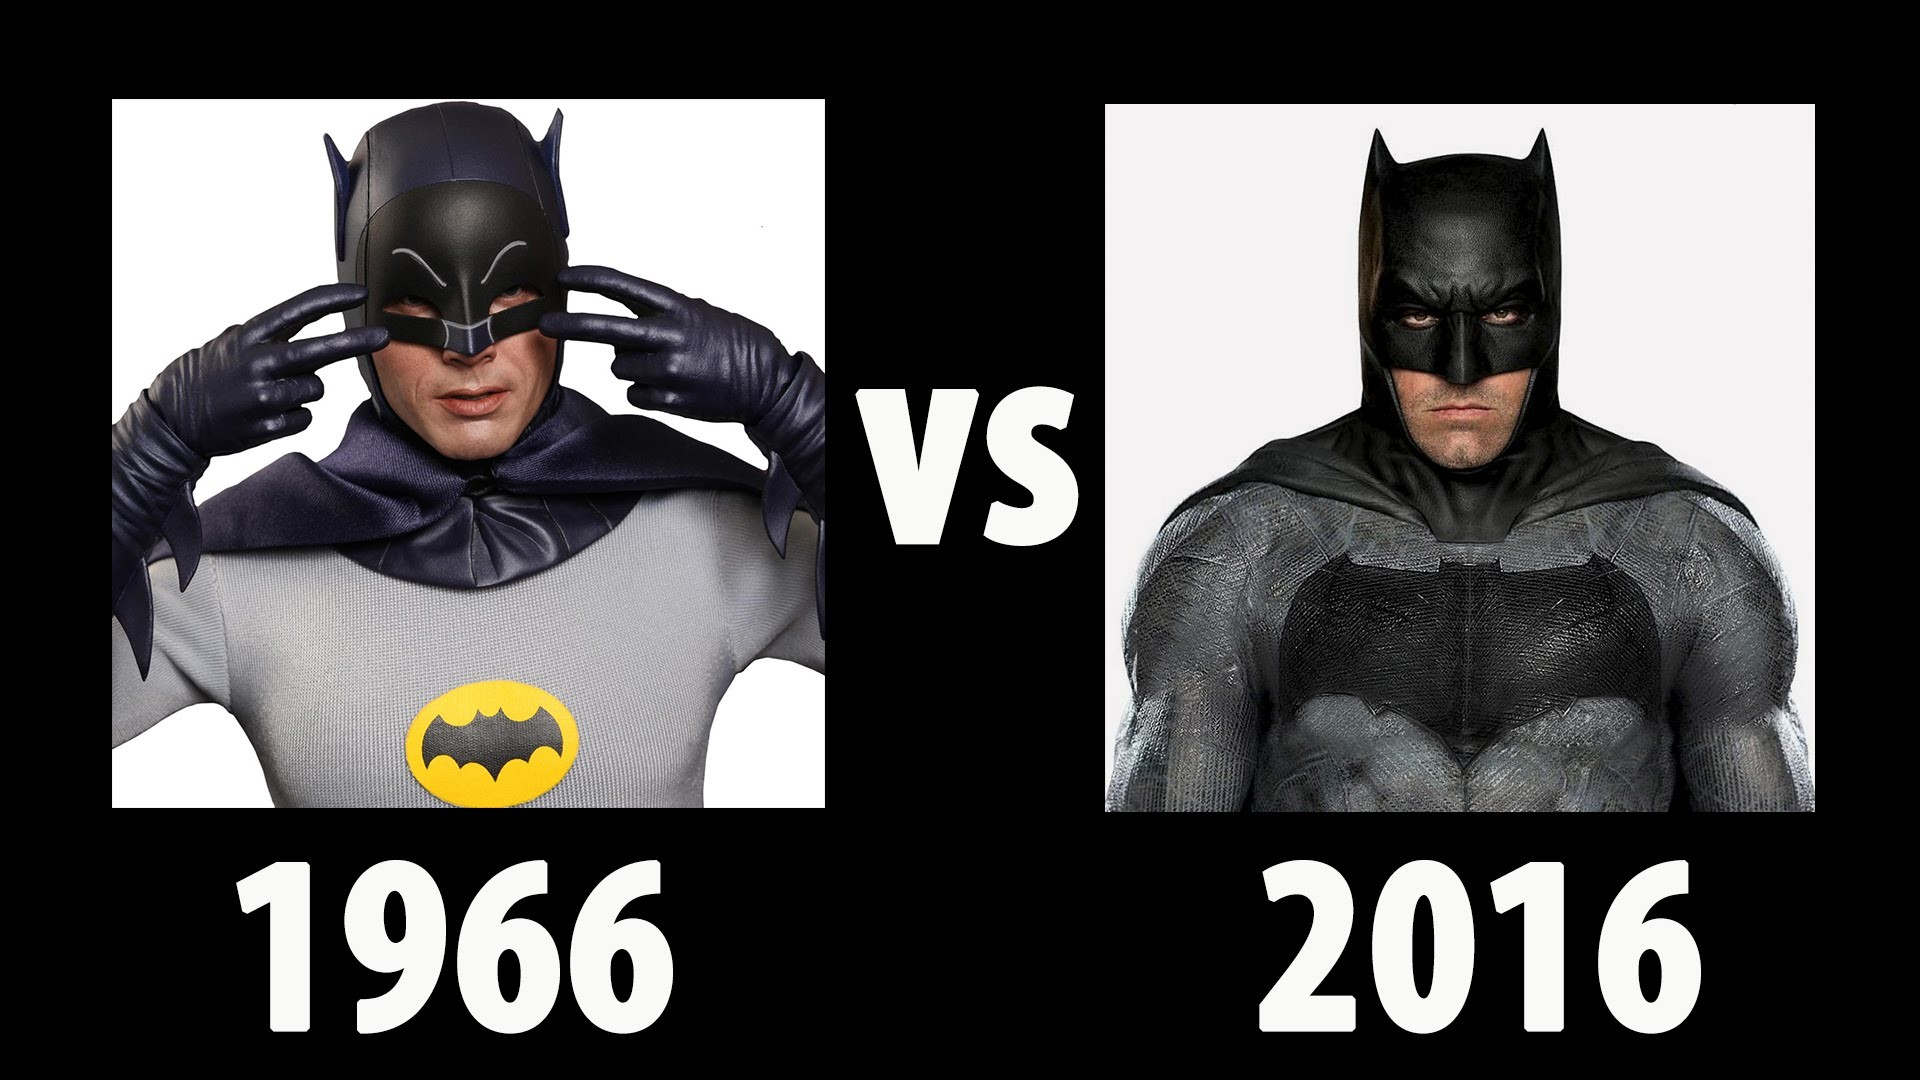 BATMAN 2016 VS BATMAN 1966